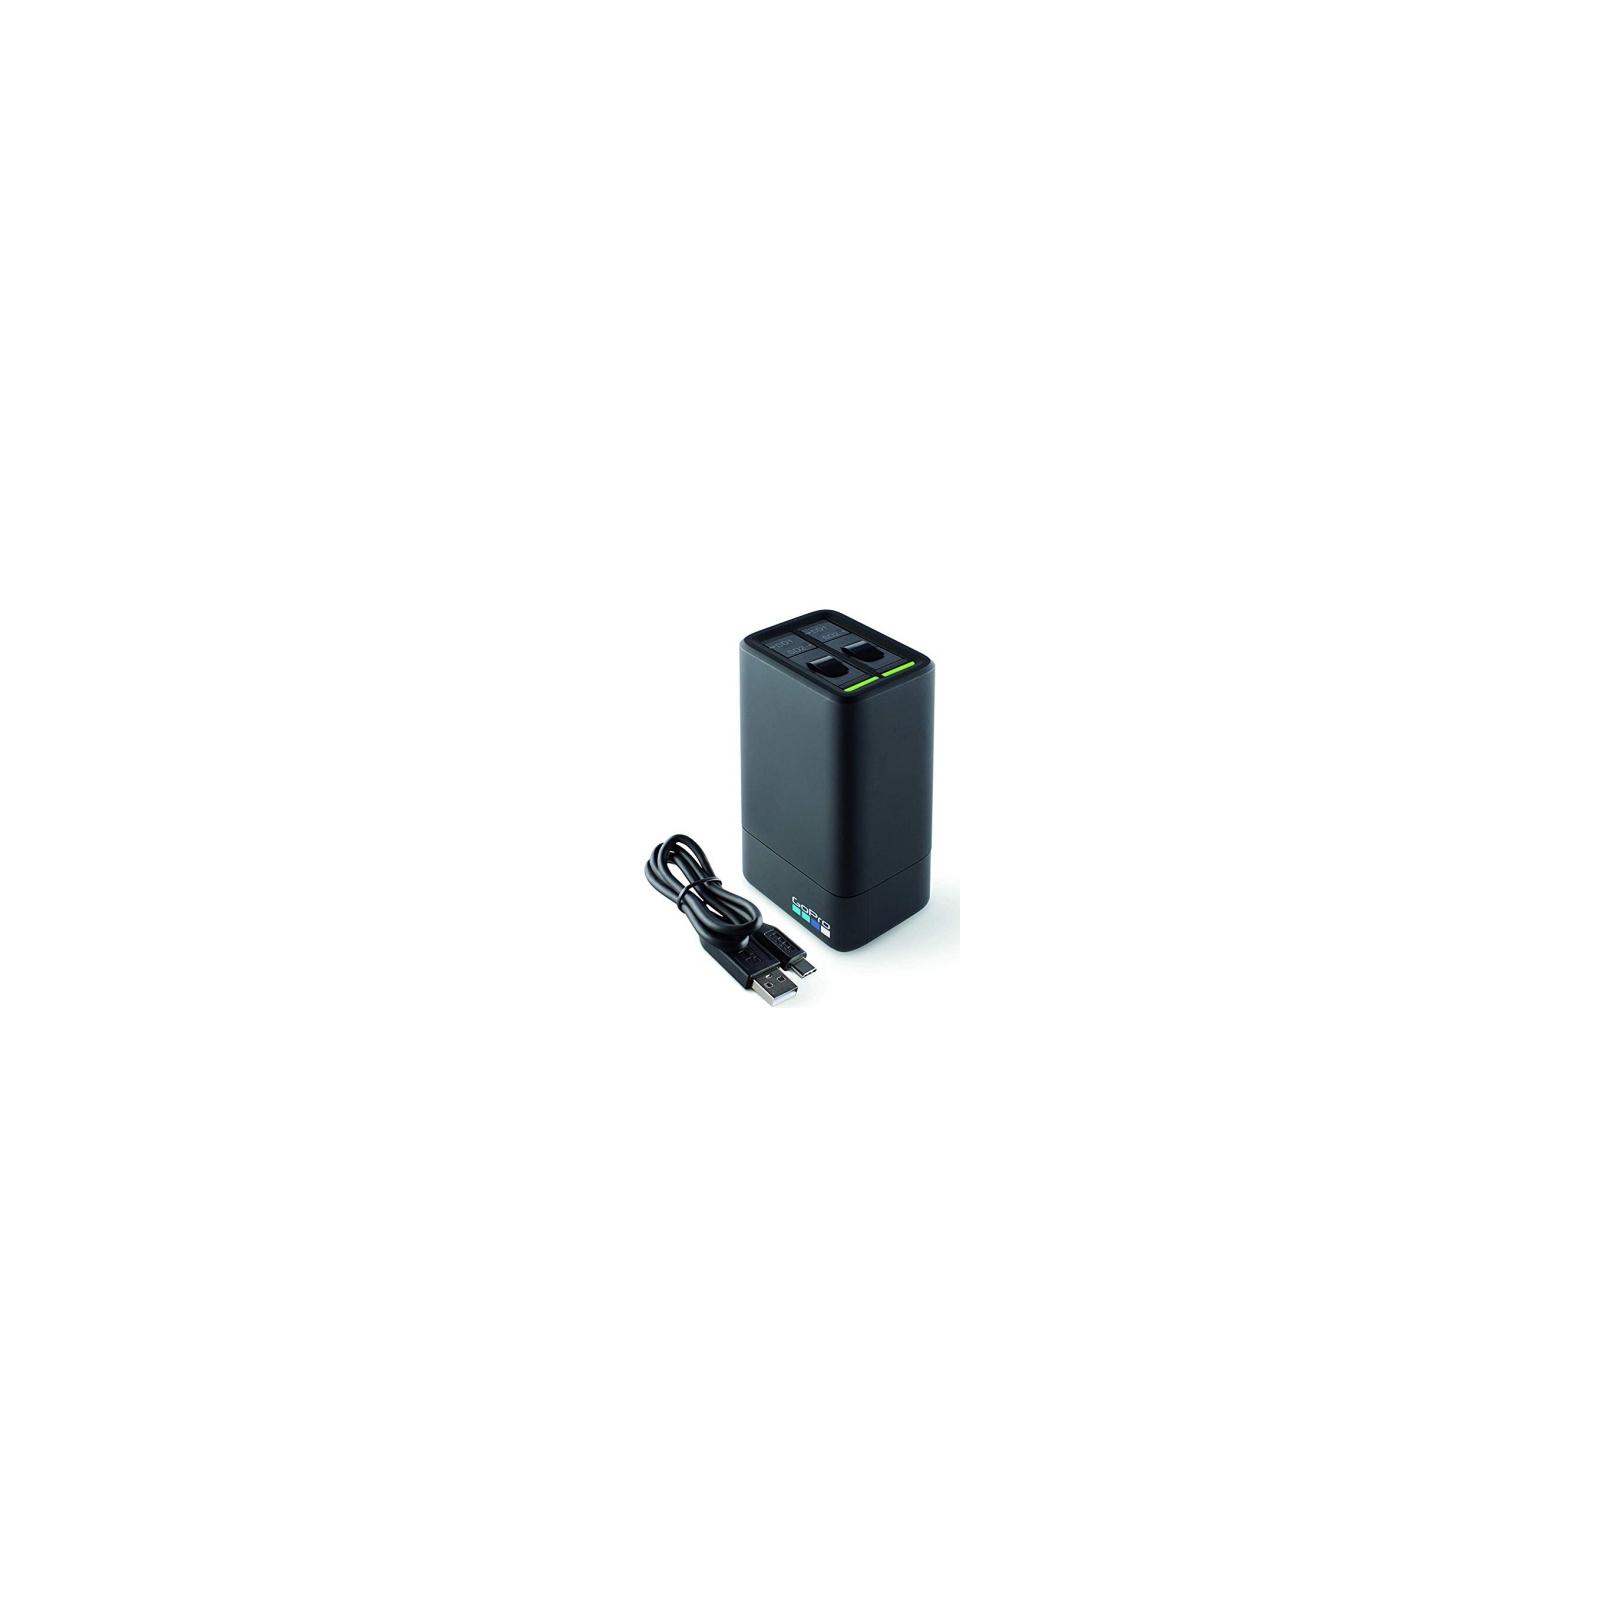 Аксессуар к экшн-камерам GoPro Fusion Dual Battery Charger + Battery (ASDBC-001-EU) изображение 4